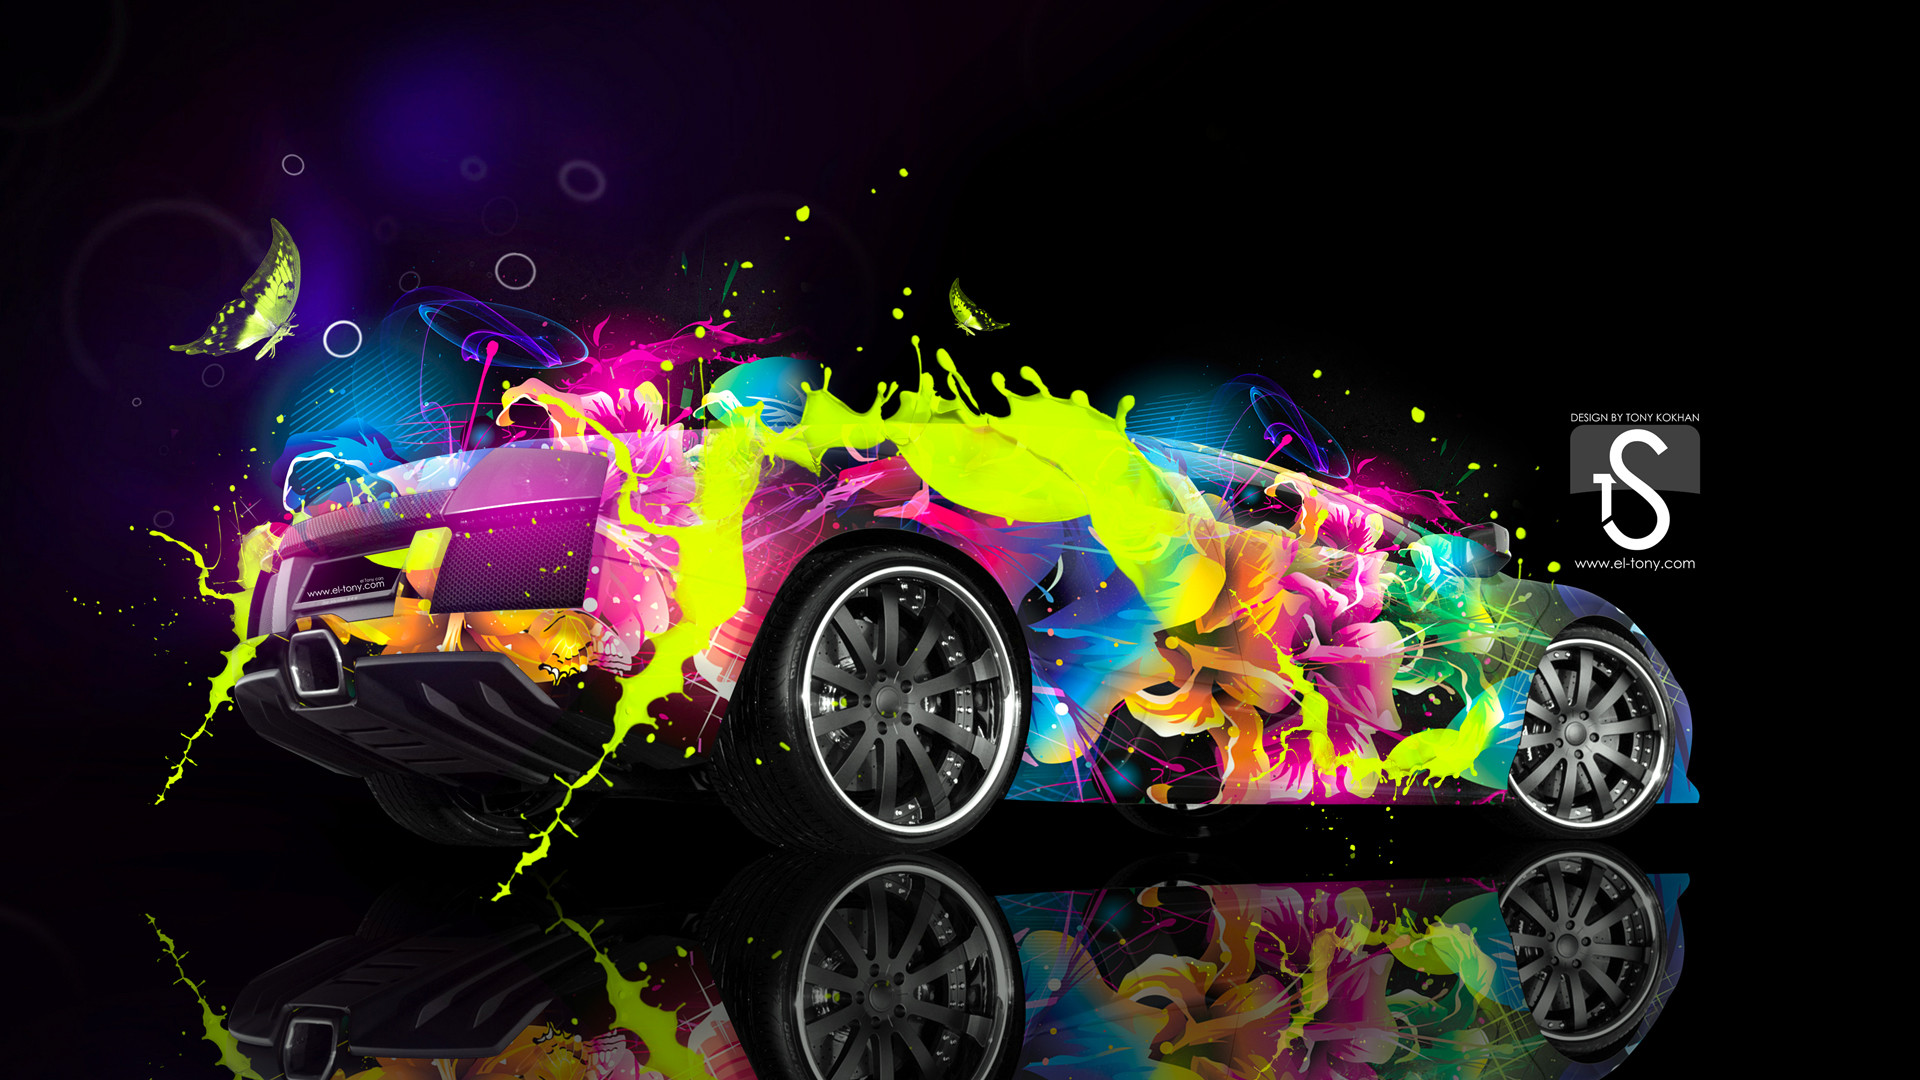 Samsung Galaxy S4 3d Wallpaper Full Hd Car Wallpapers 1920x1080 63 Images